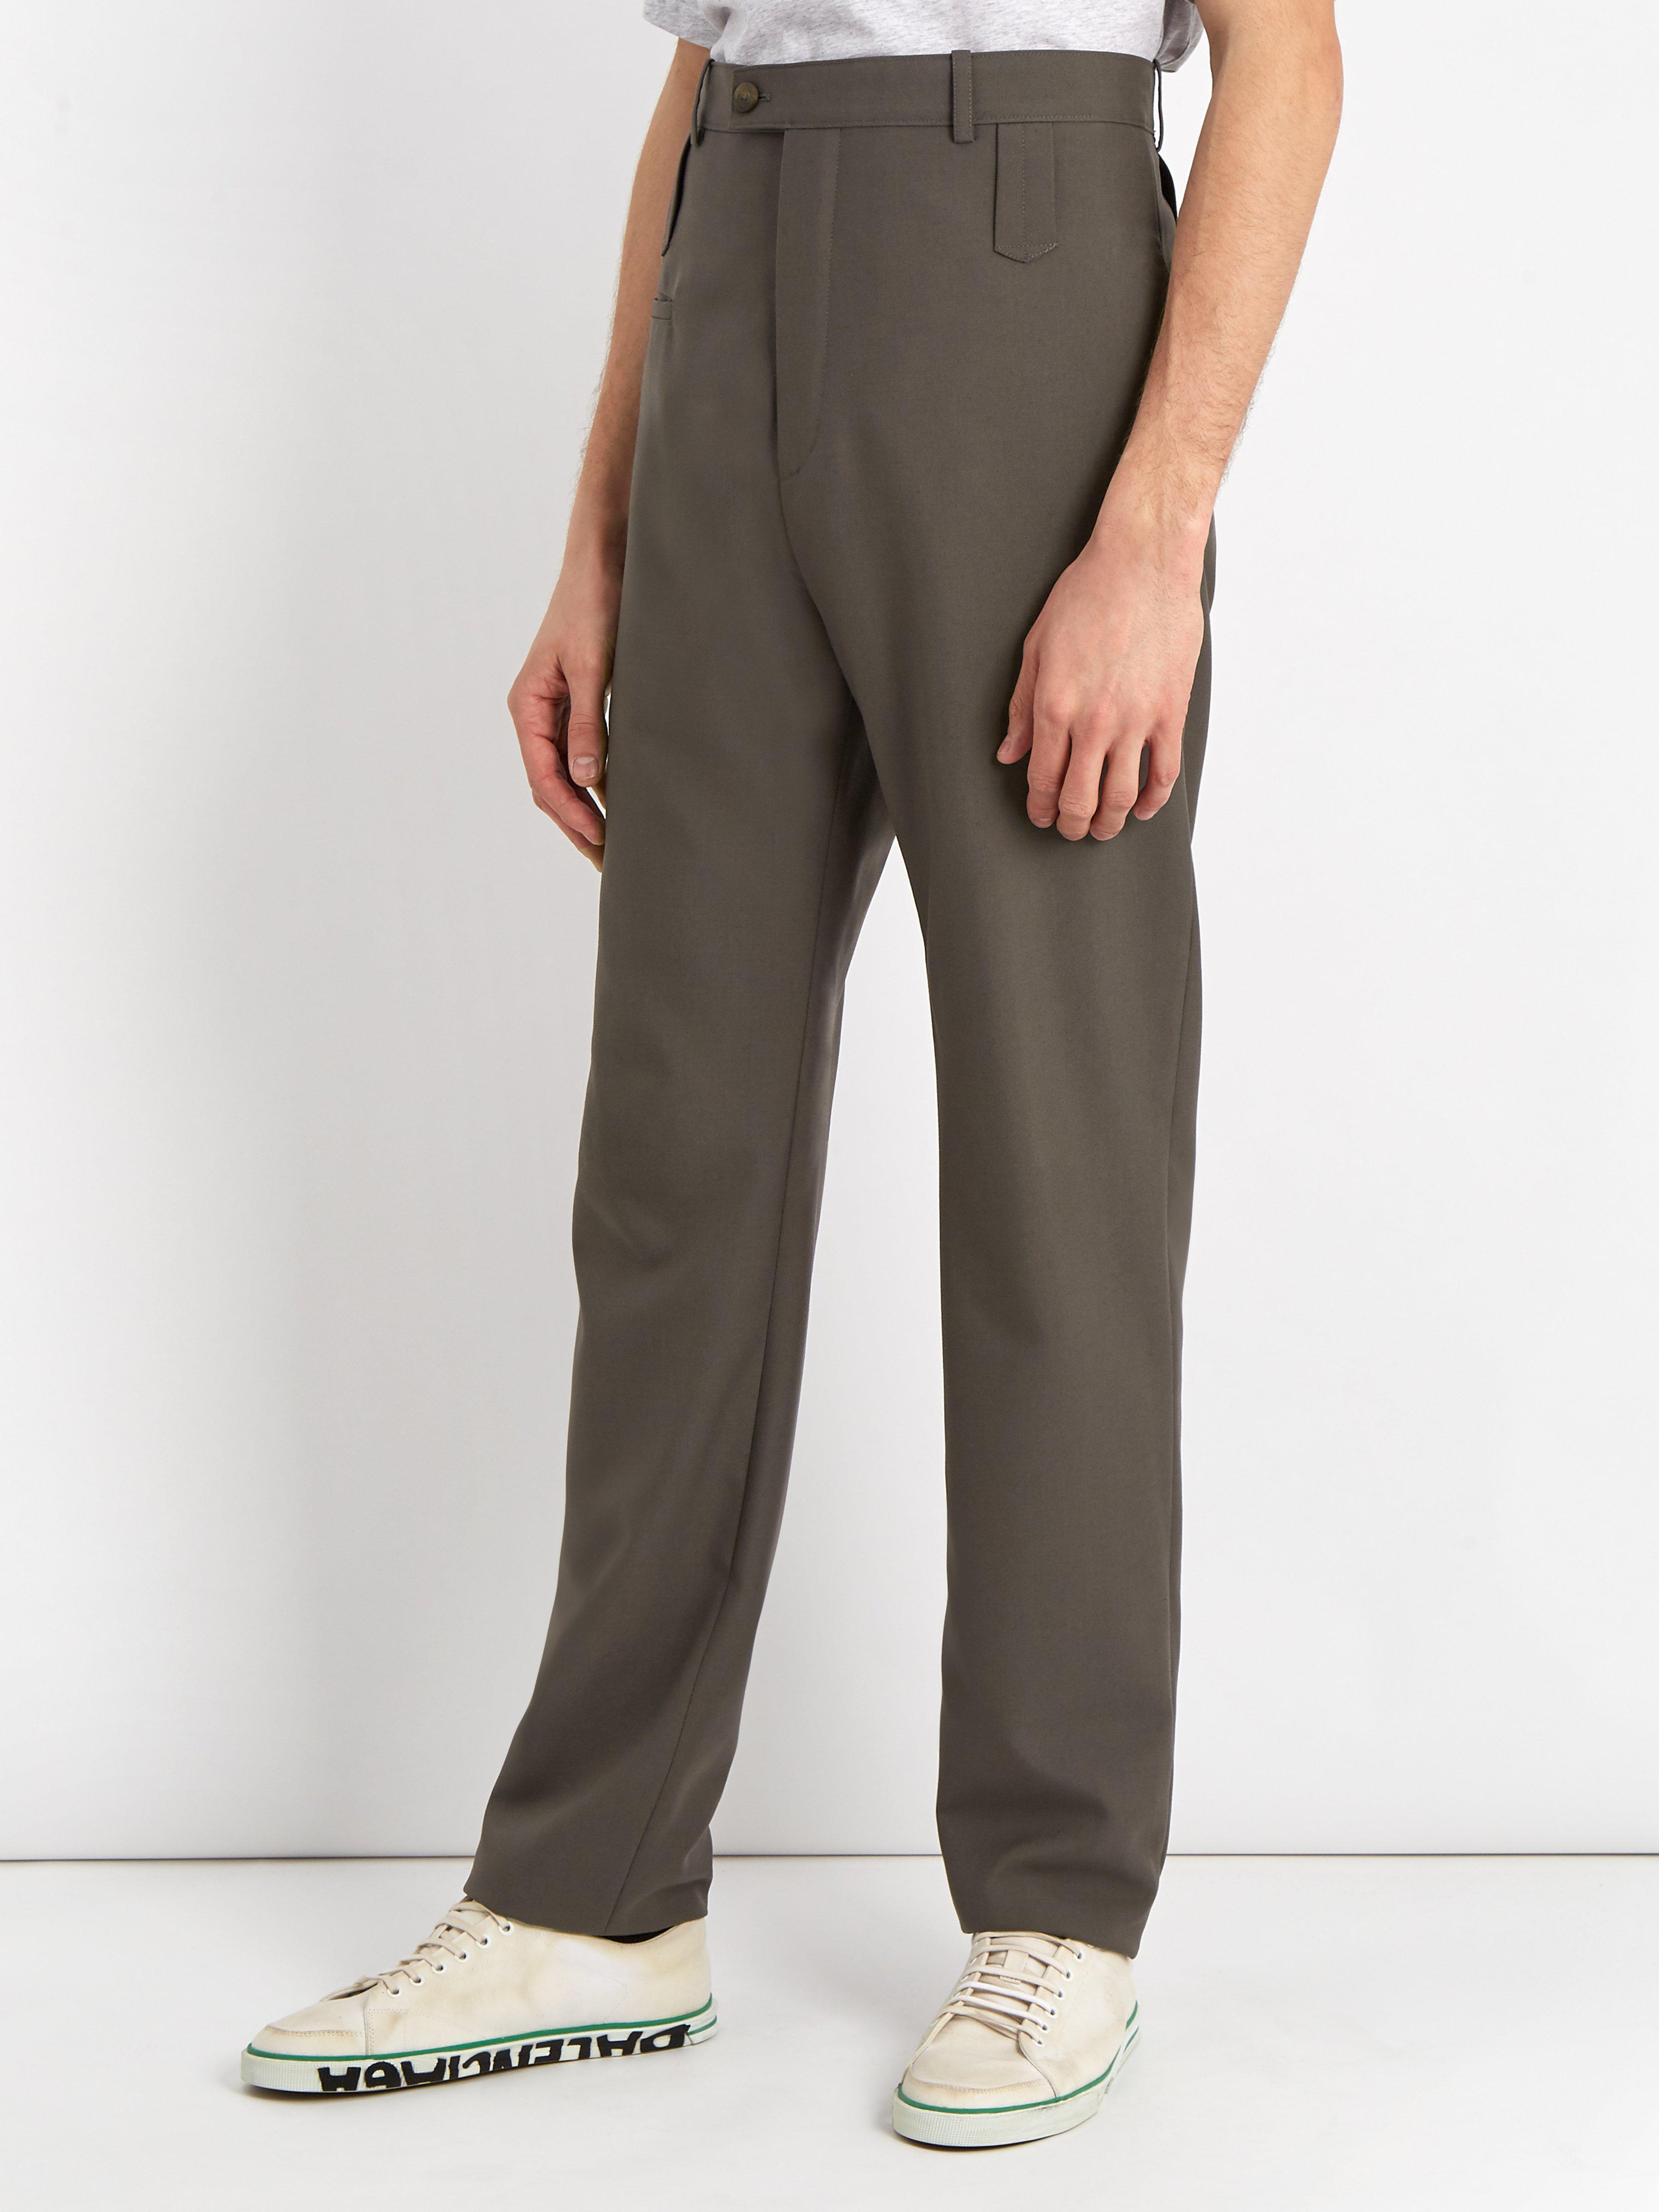 Balenciaga High Rise Wool Blend Trousers in Grey (Grey) for Men